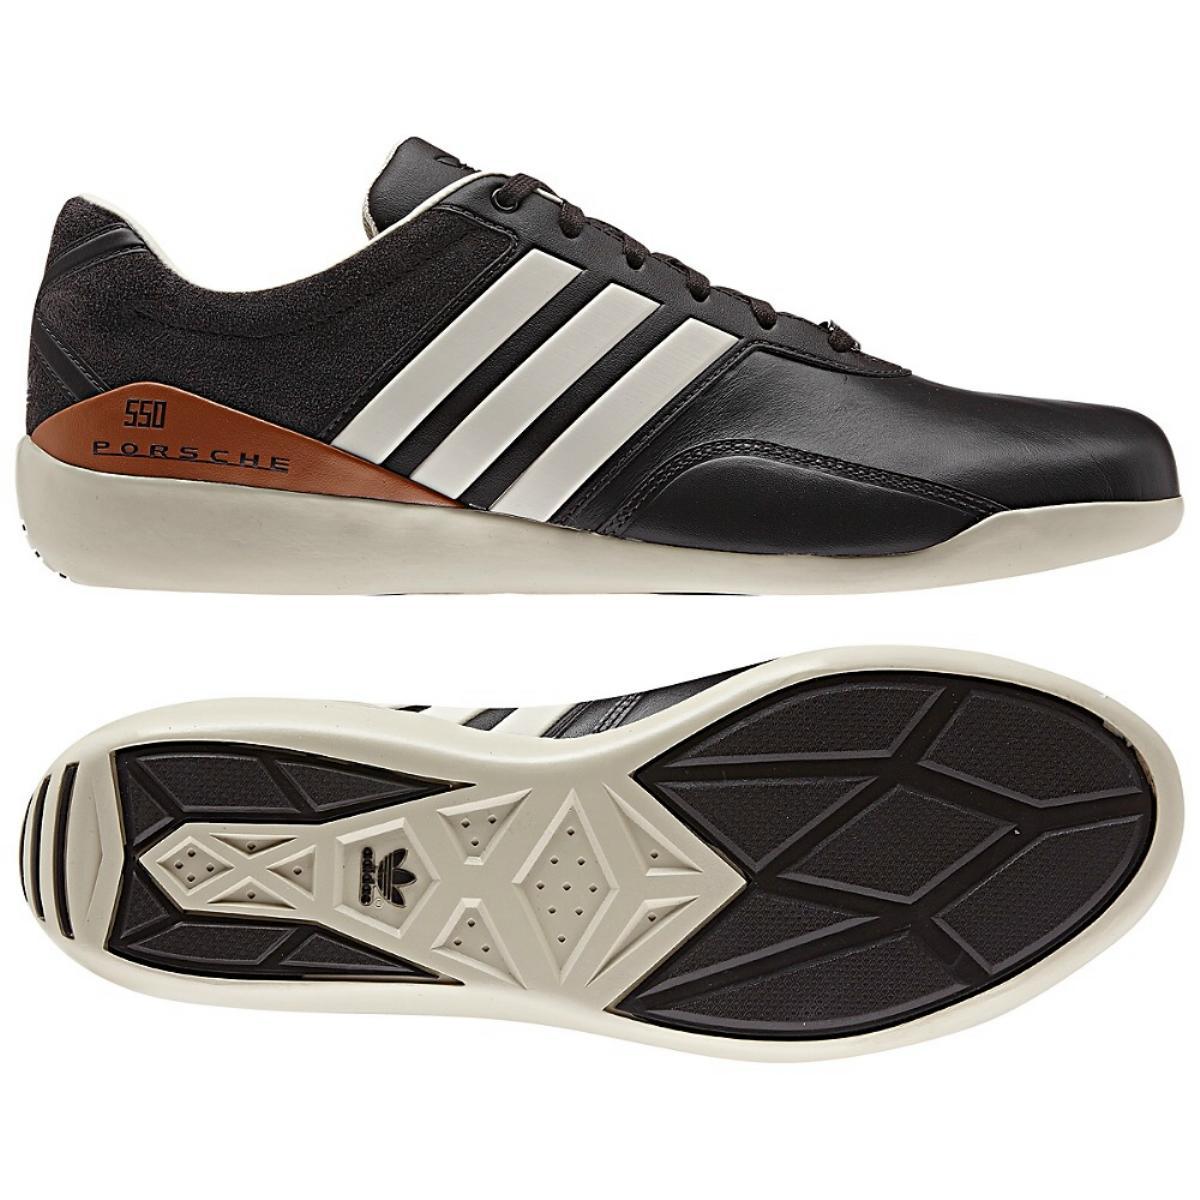 adidas porsche 550 sport schuhe turnschuhe sneaker herren. Black Bedroom Furniture Sets. Home Design Ideas